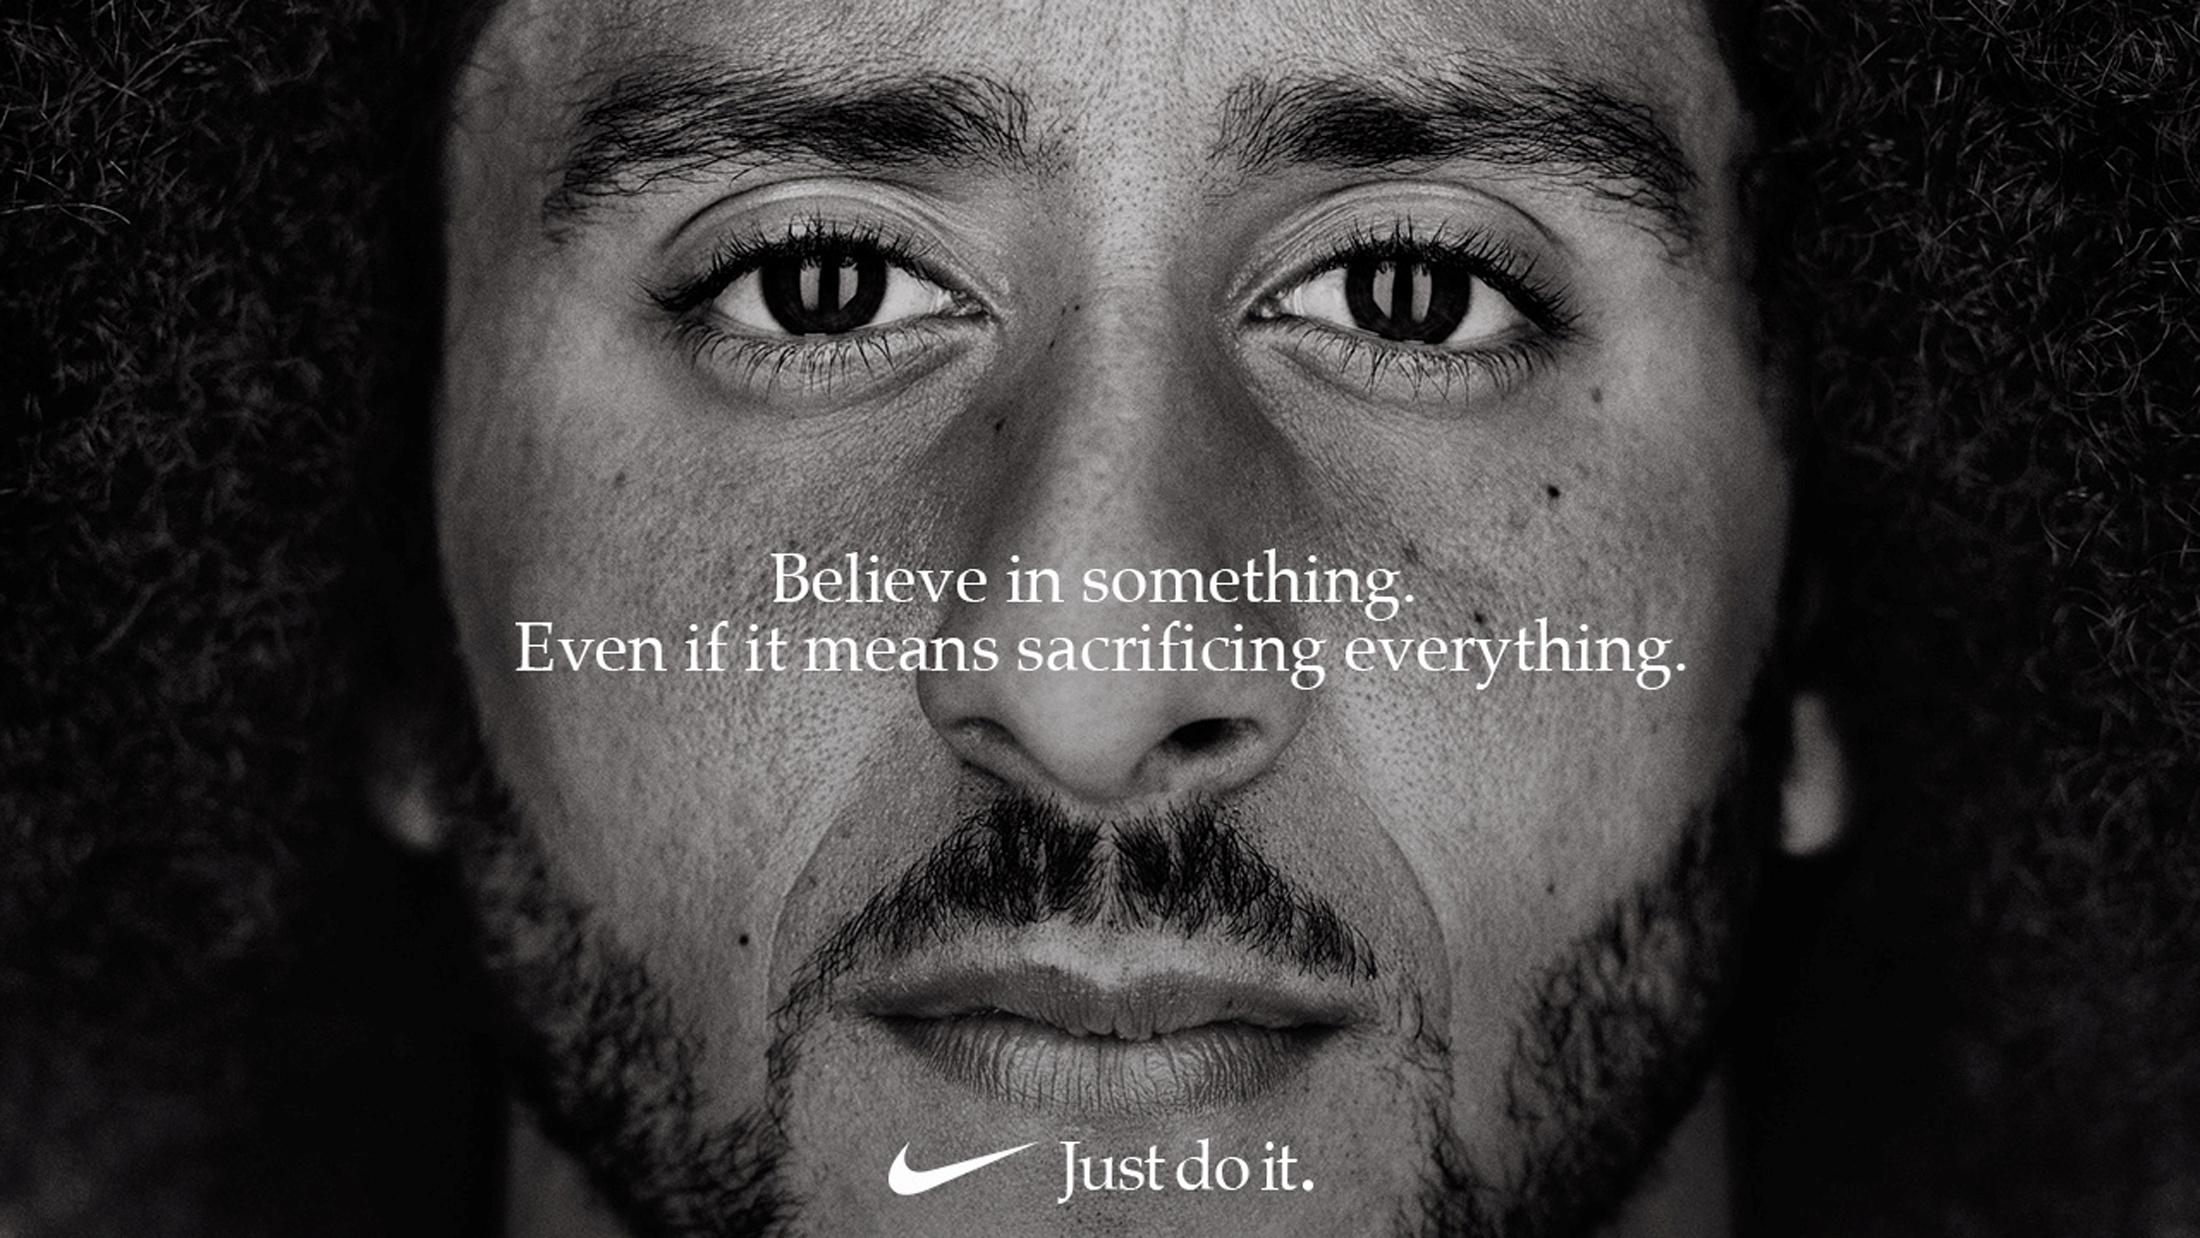 d7e7b545df231 A Nike boycott over Colin Kaepernick is unlikely to hurt the swoosh ...